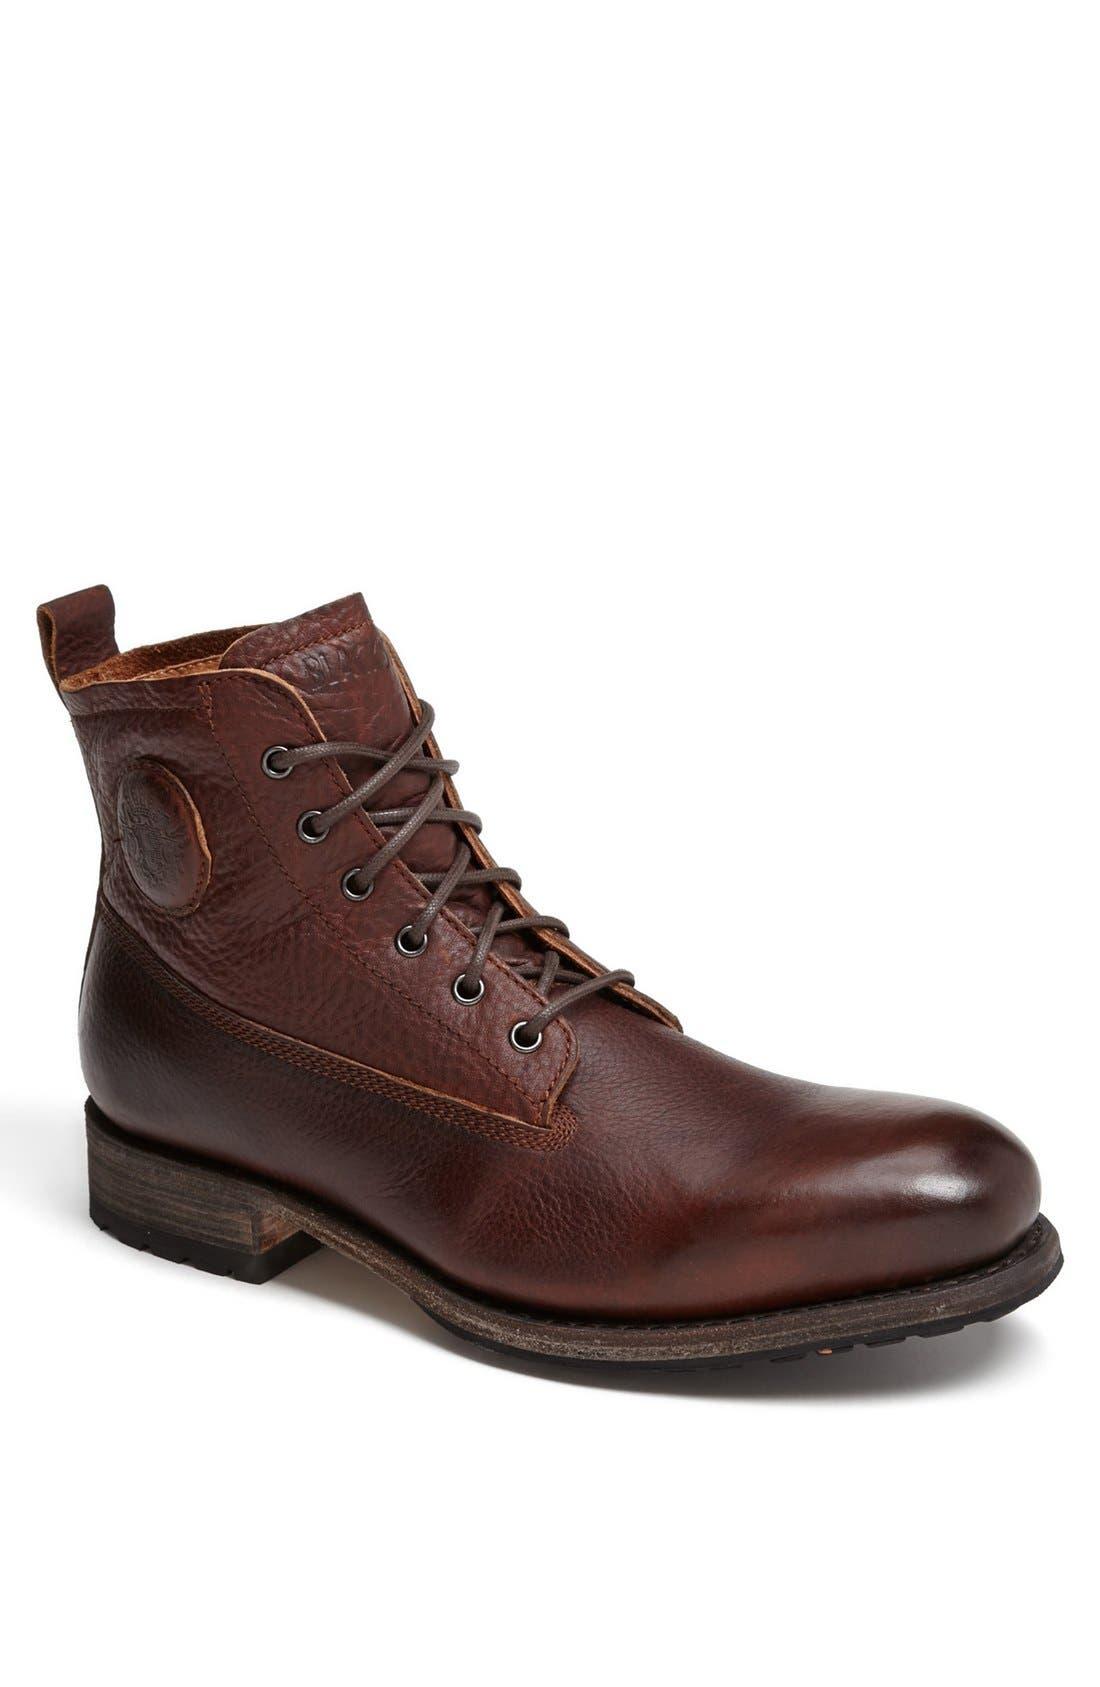 Main Image - Blackstone 'GM 09' Plain Toe Boot (Men)